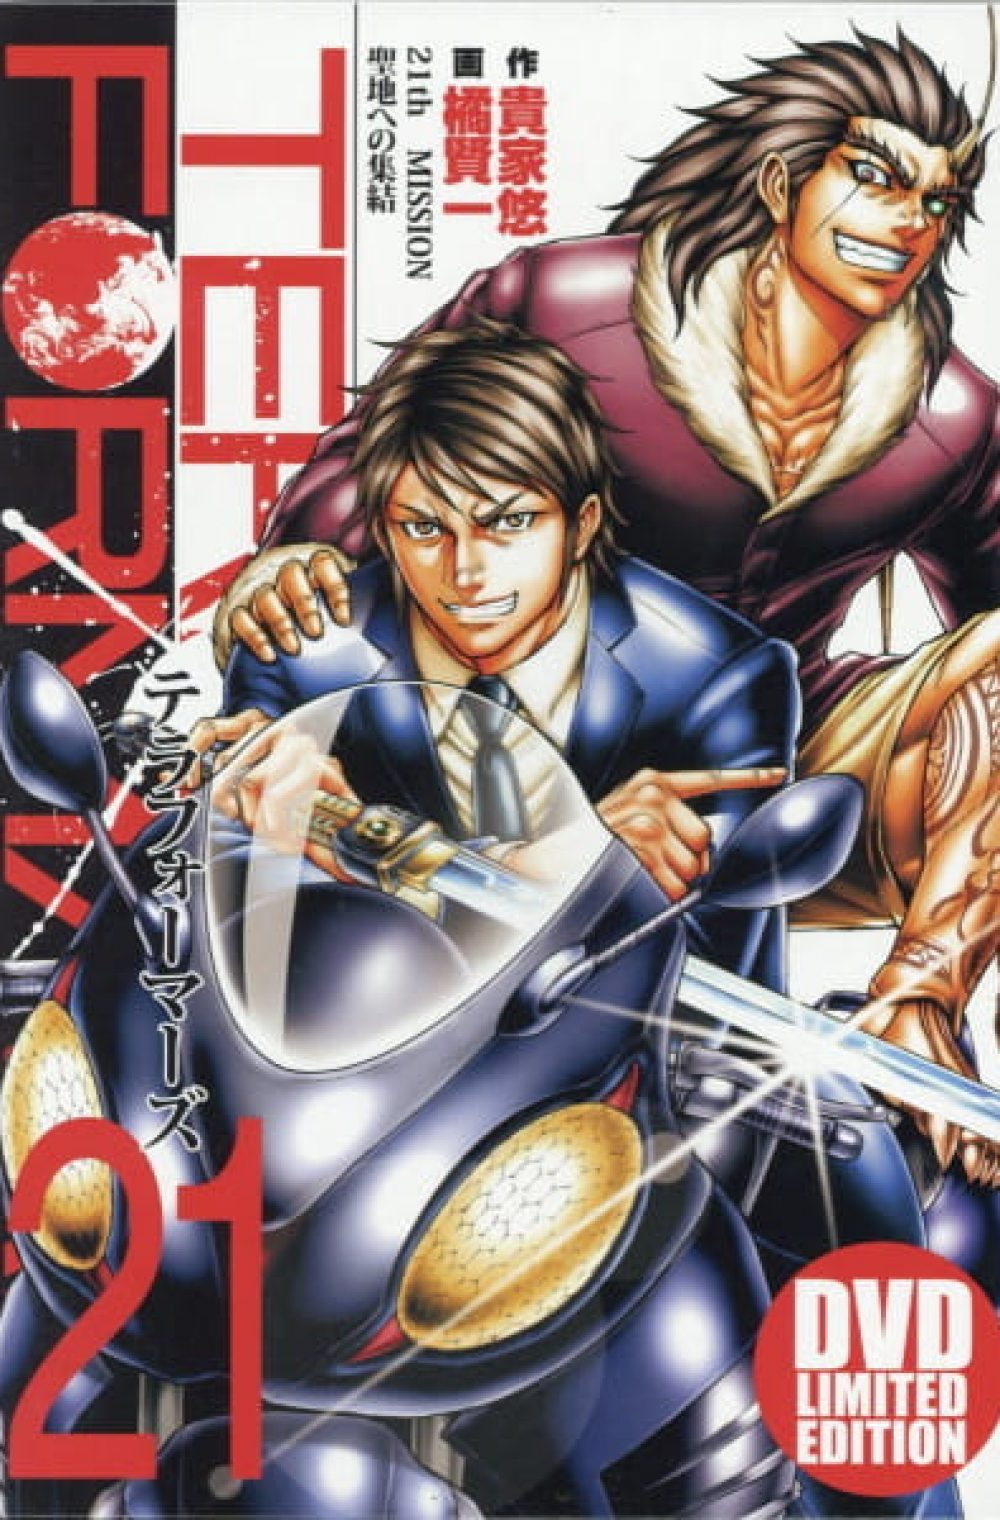 Terra Formars OVA: Earth-hen (UNCENSORED)